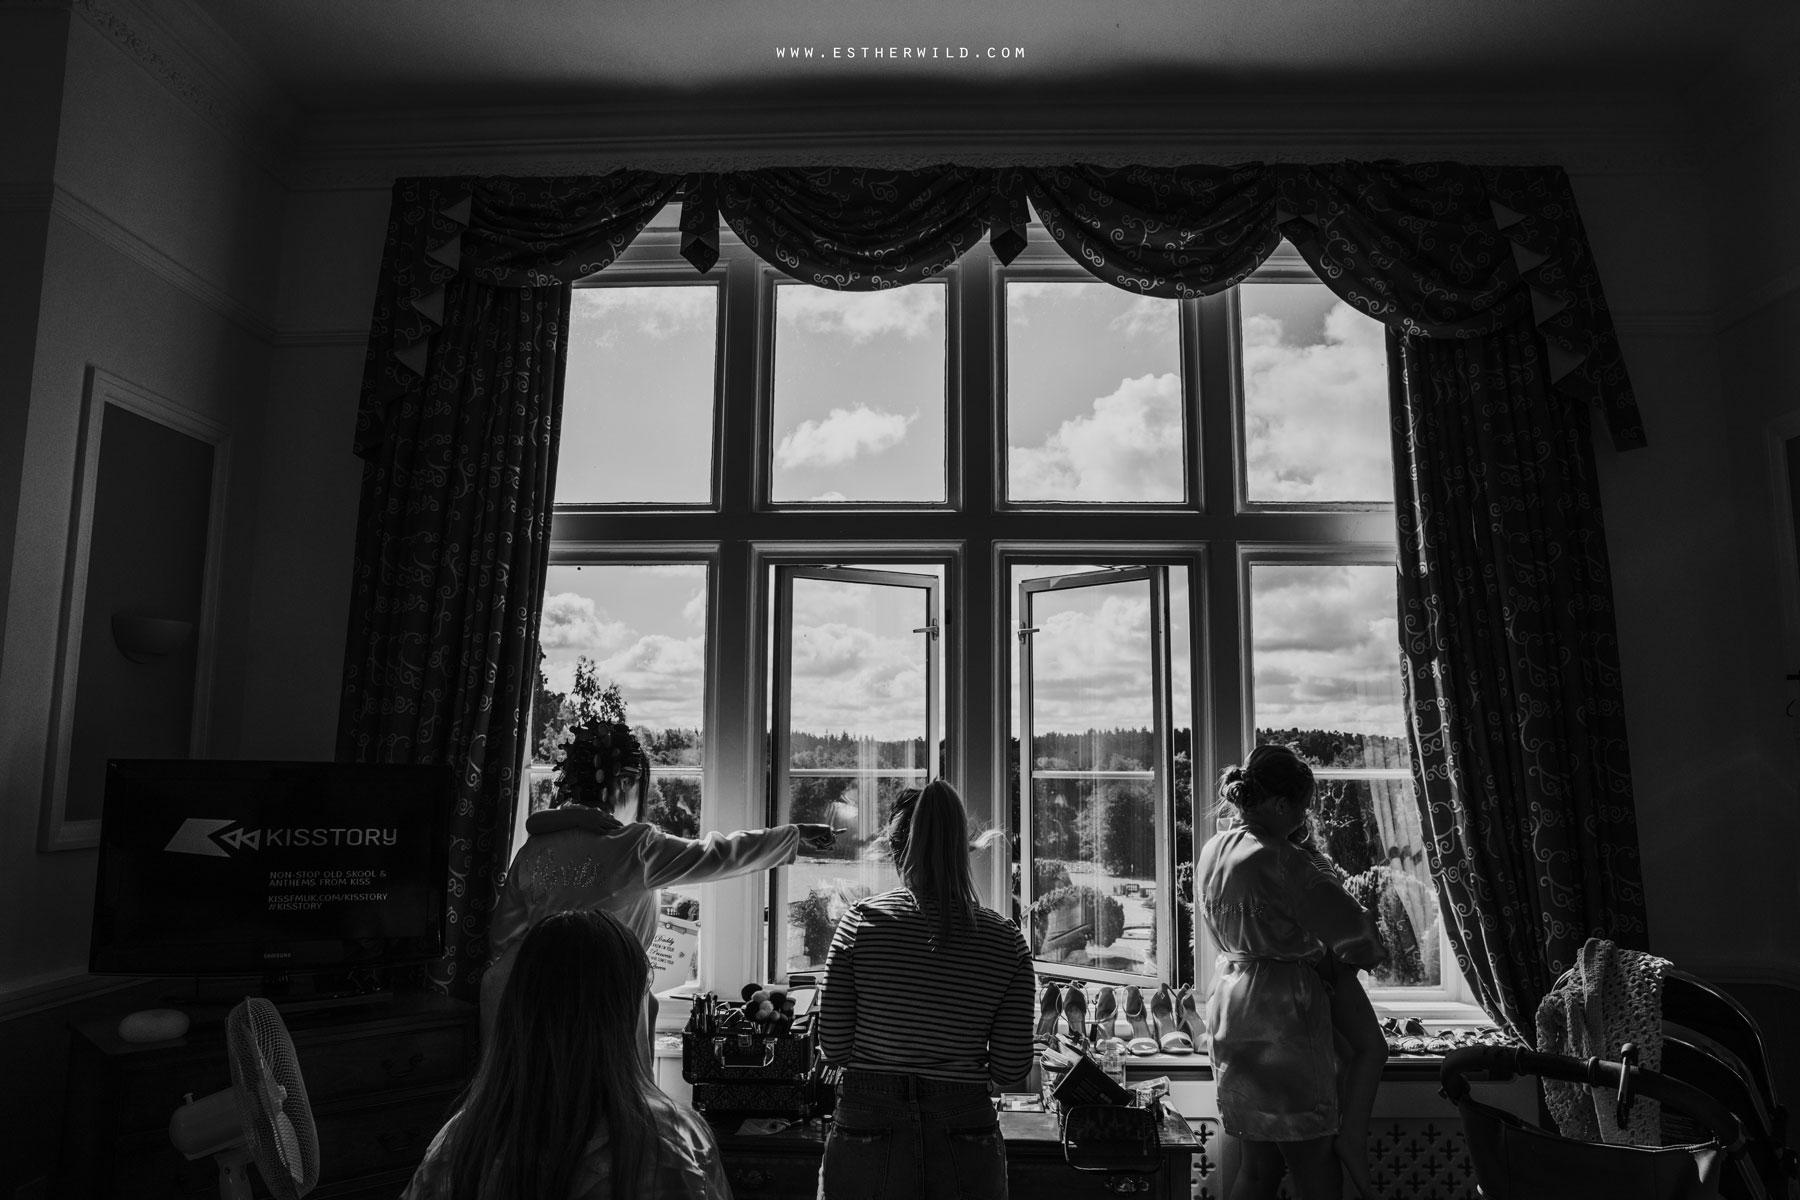 Lynford_Hall_Wedding_Thetford_Mundford_Esther_Wild_Photographer_IMG_0172-2.jpg